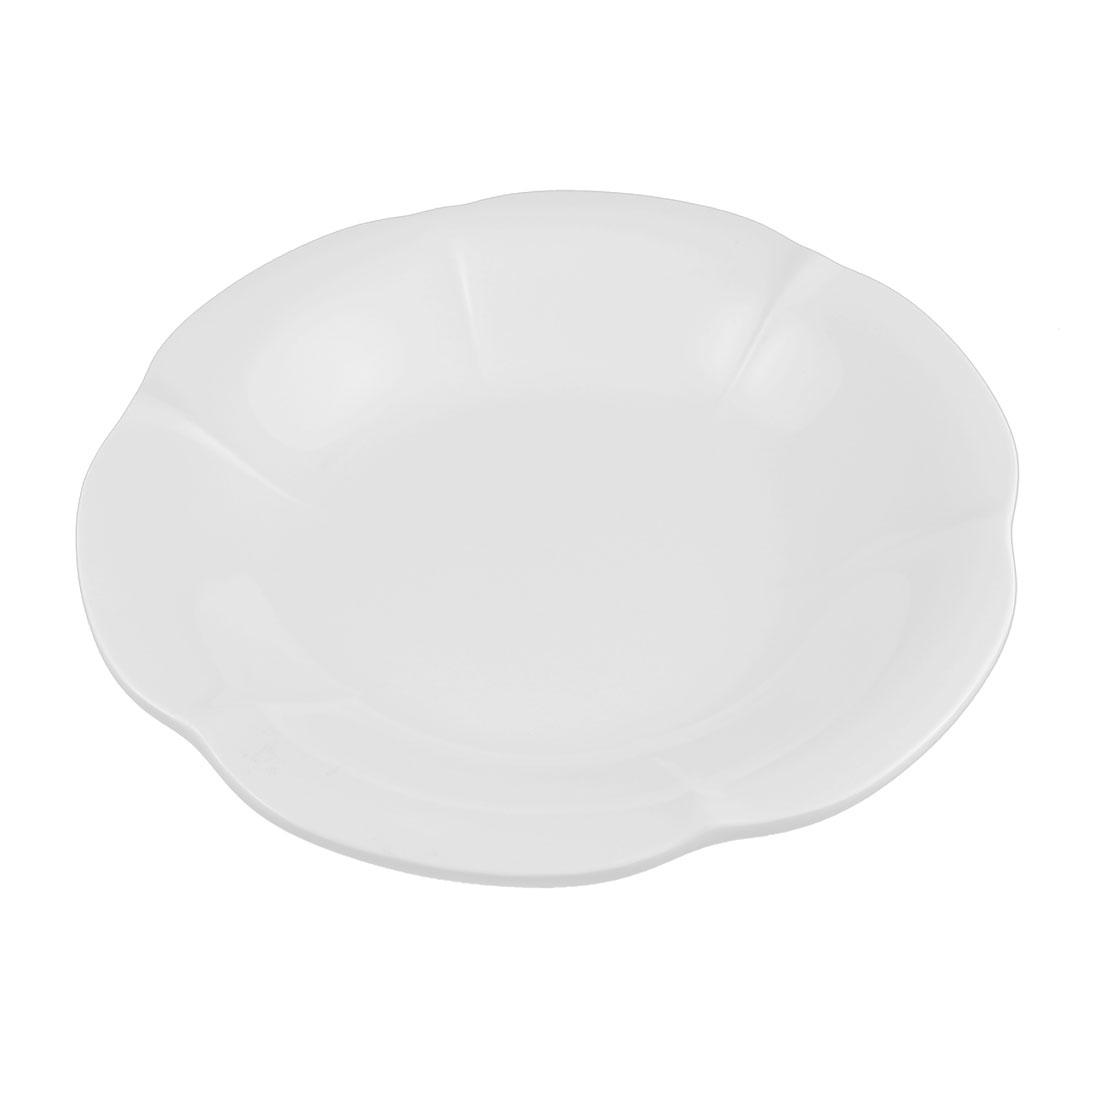 Hotel Plastic Lotus Design Salad Dessert Dish Plate White